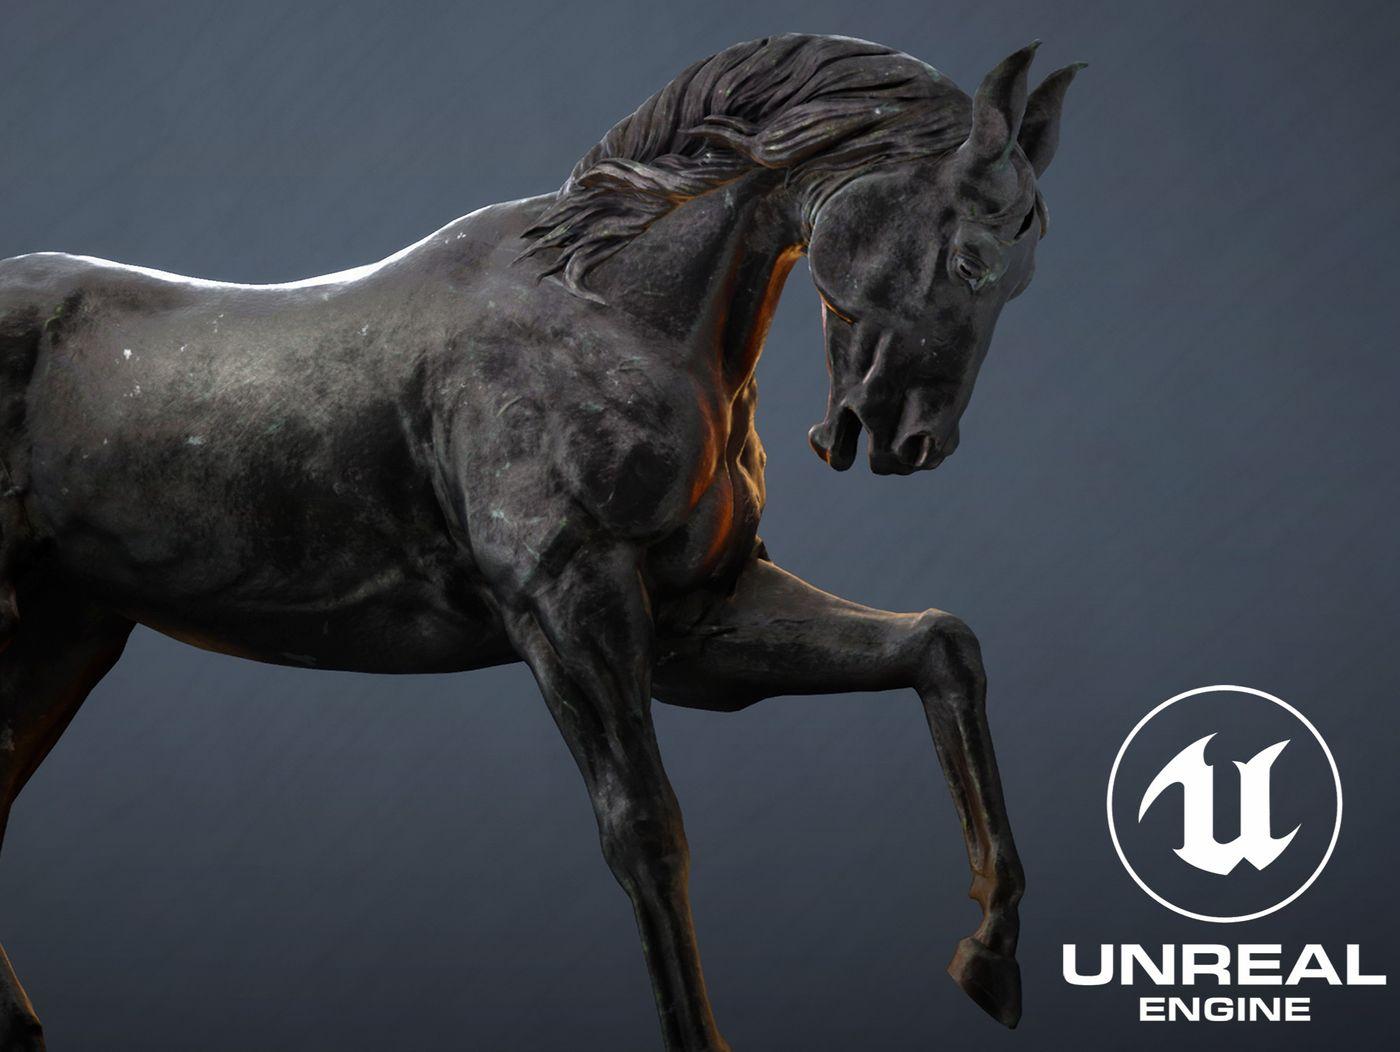 Richard the Lionheart's horse